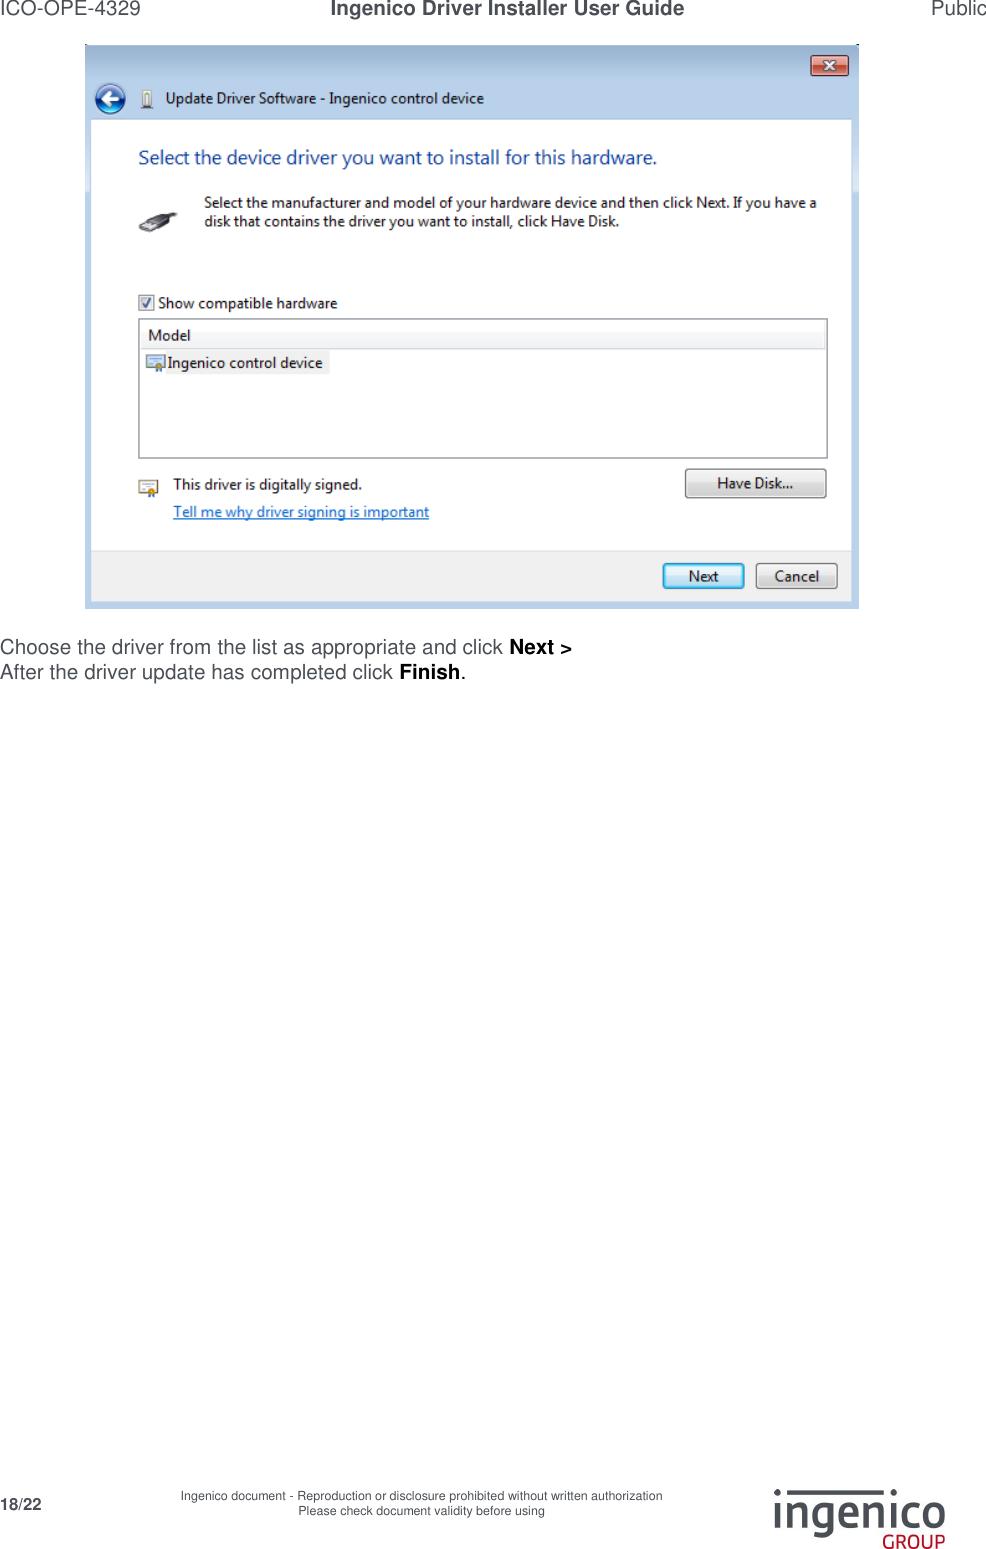 Report Ingenico Driver Installer User Guide